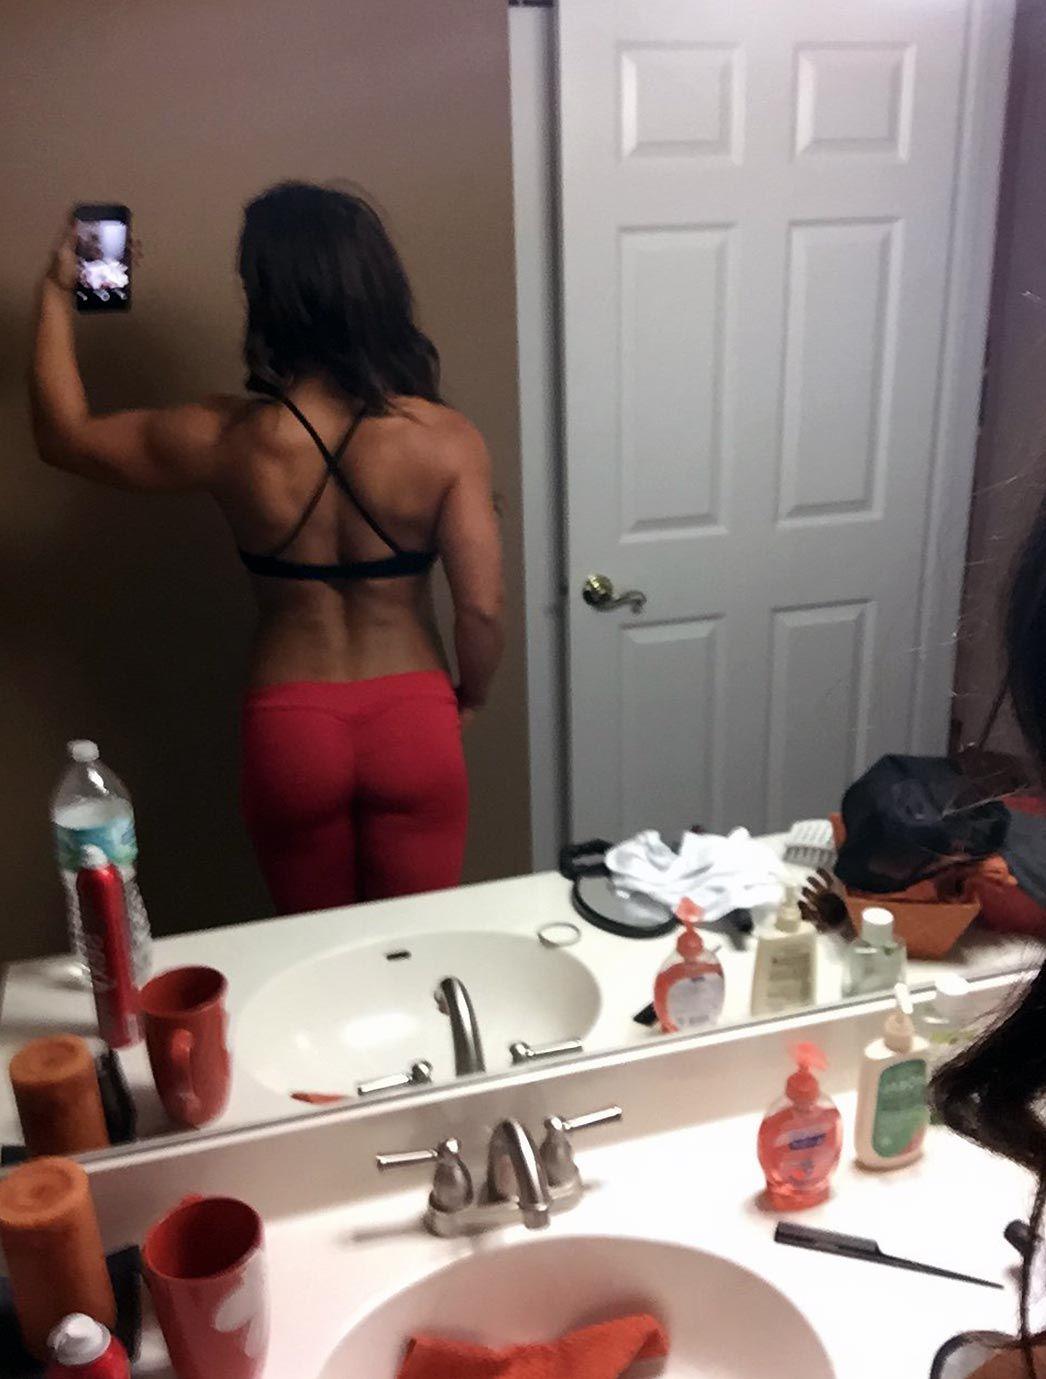 Celeste Bonin Nude Leaked The Fappening & Sexy 0122